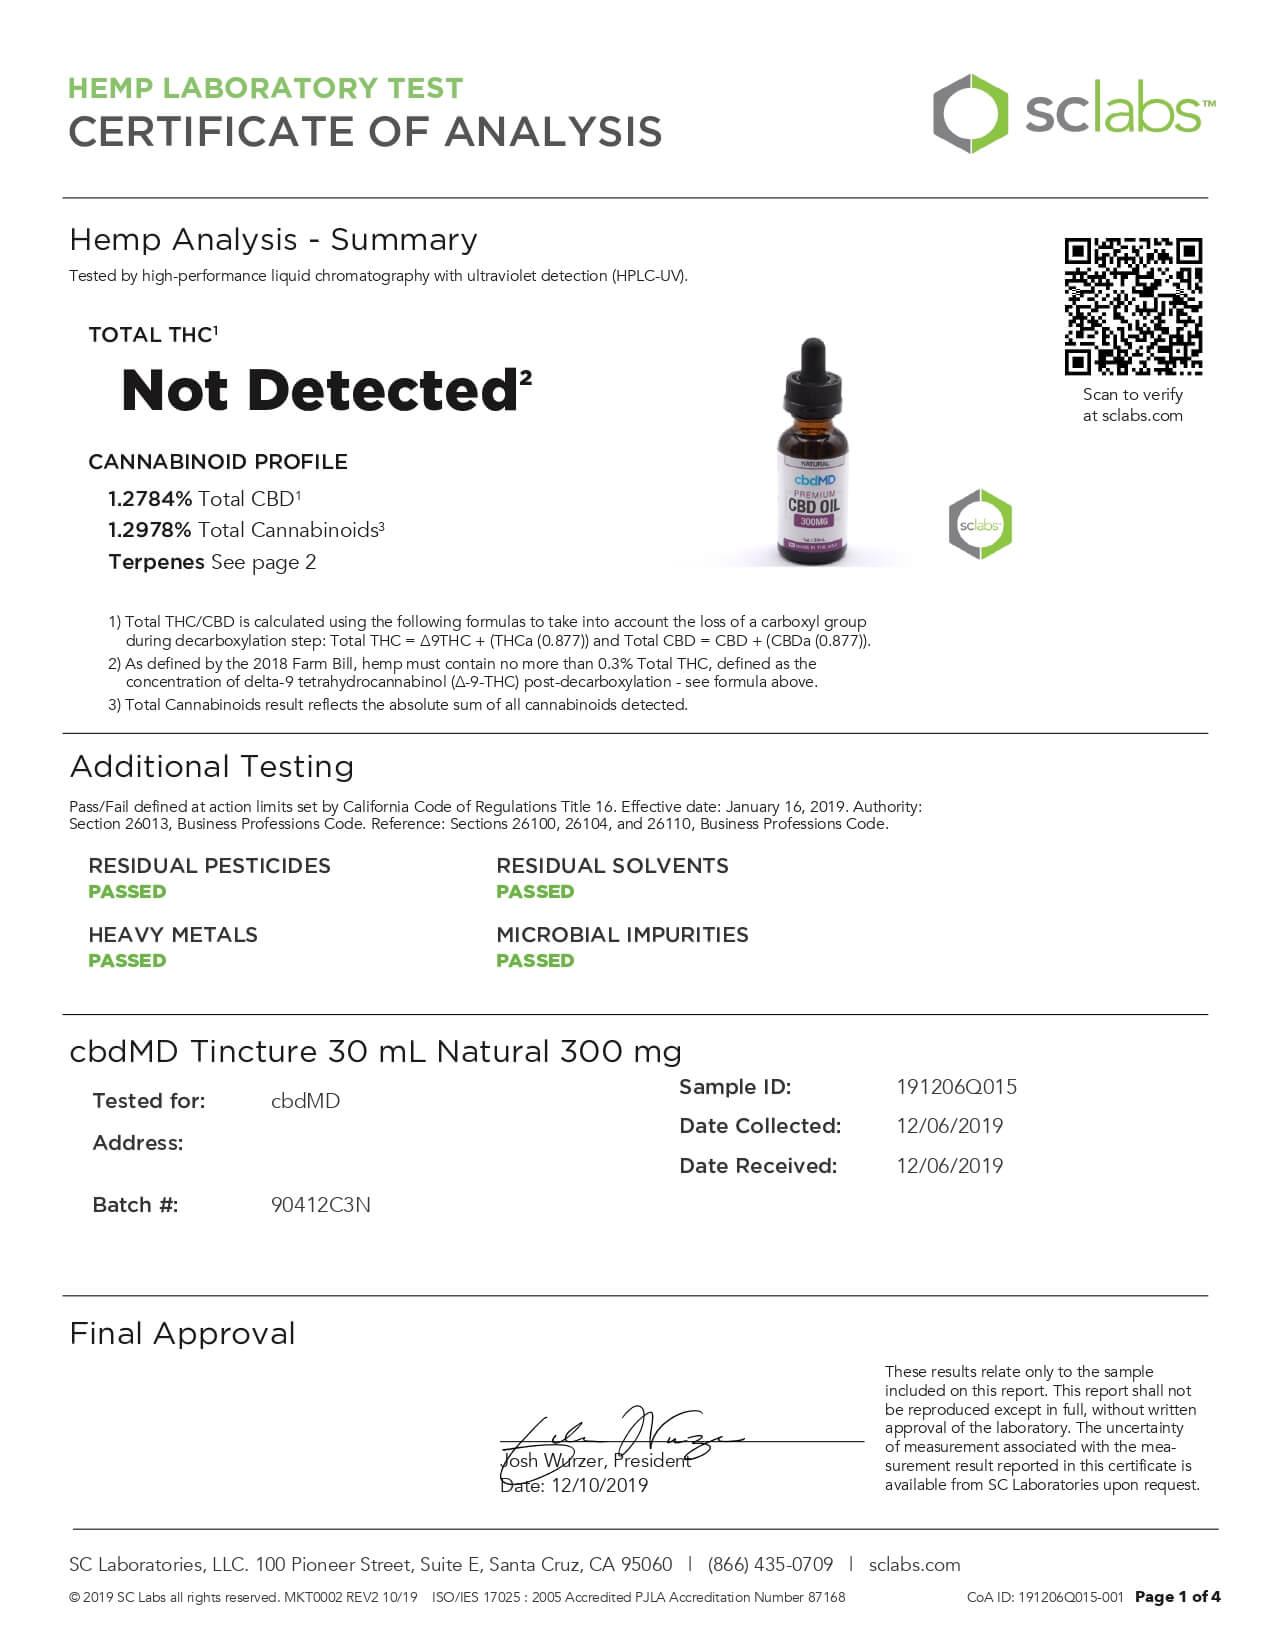 cbdMD CBD Tincture Broad Specrum Natural 30ml 300mg Lab Report